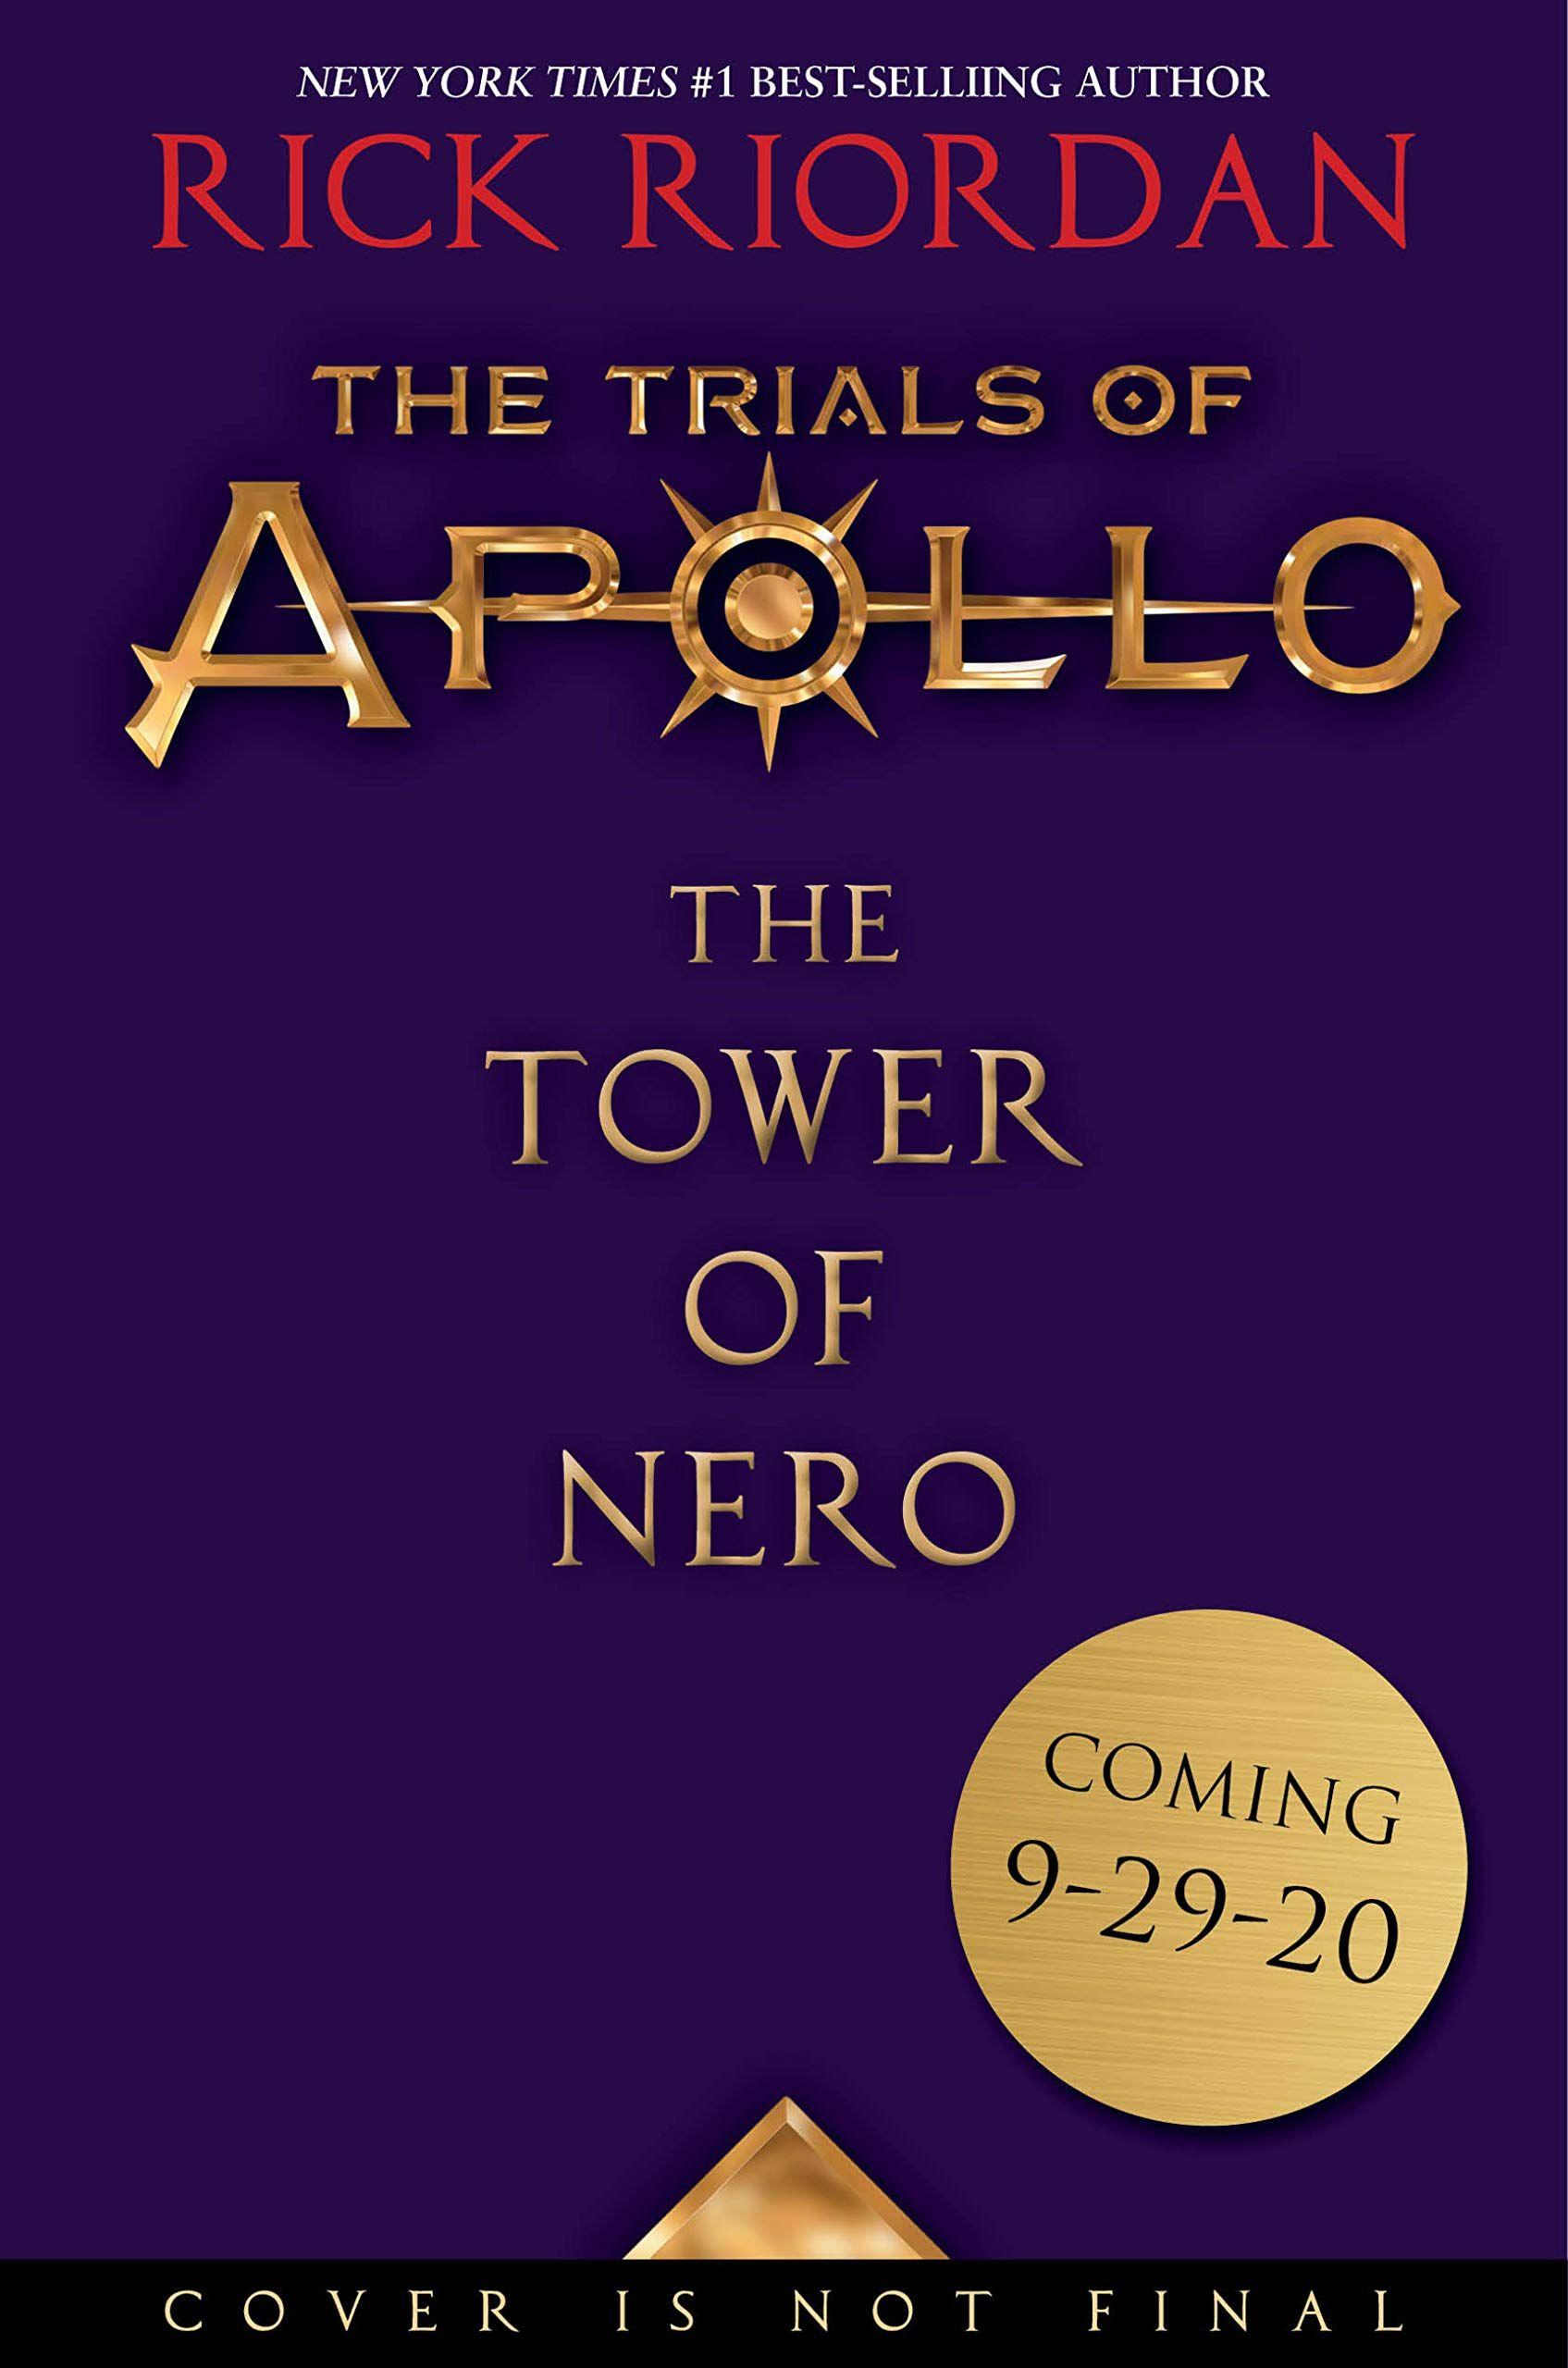 Pdf The Tower Of Nero The Trials Of Apollo 5 By Rick Riordan